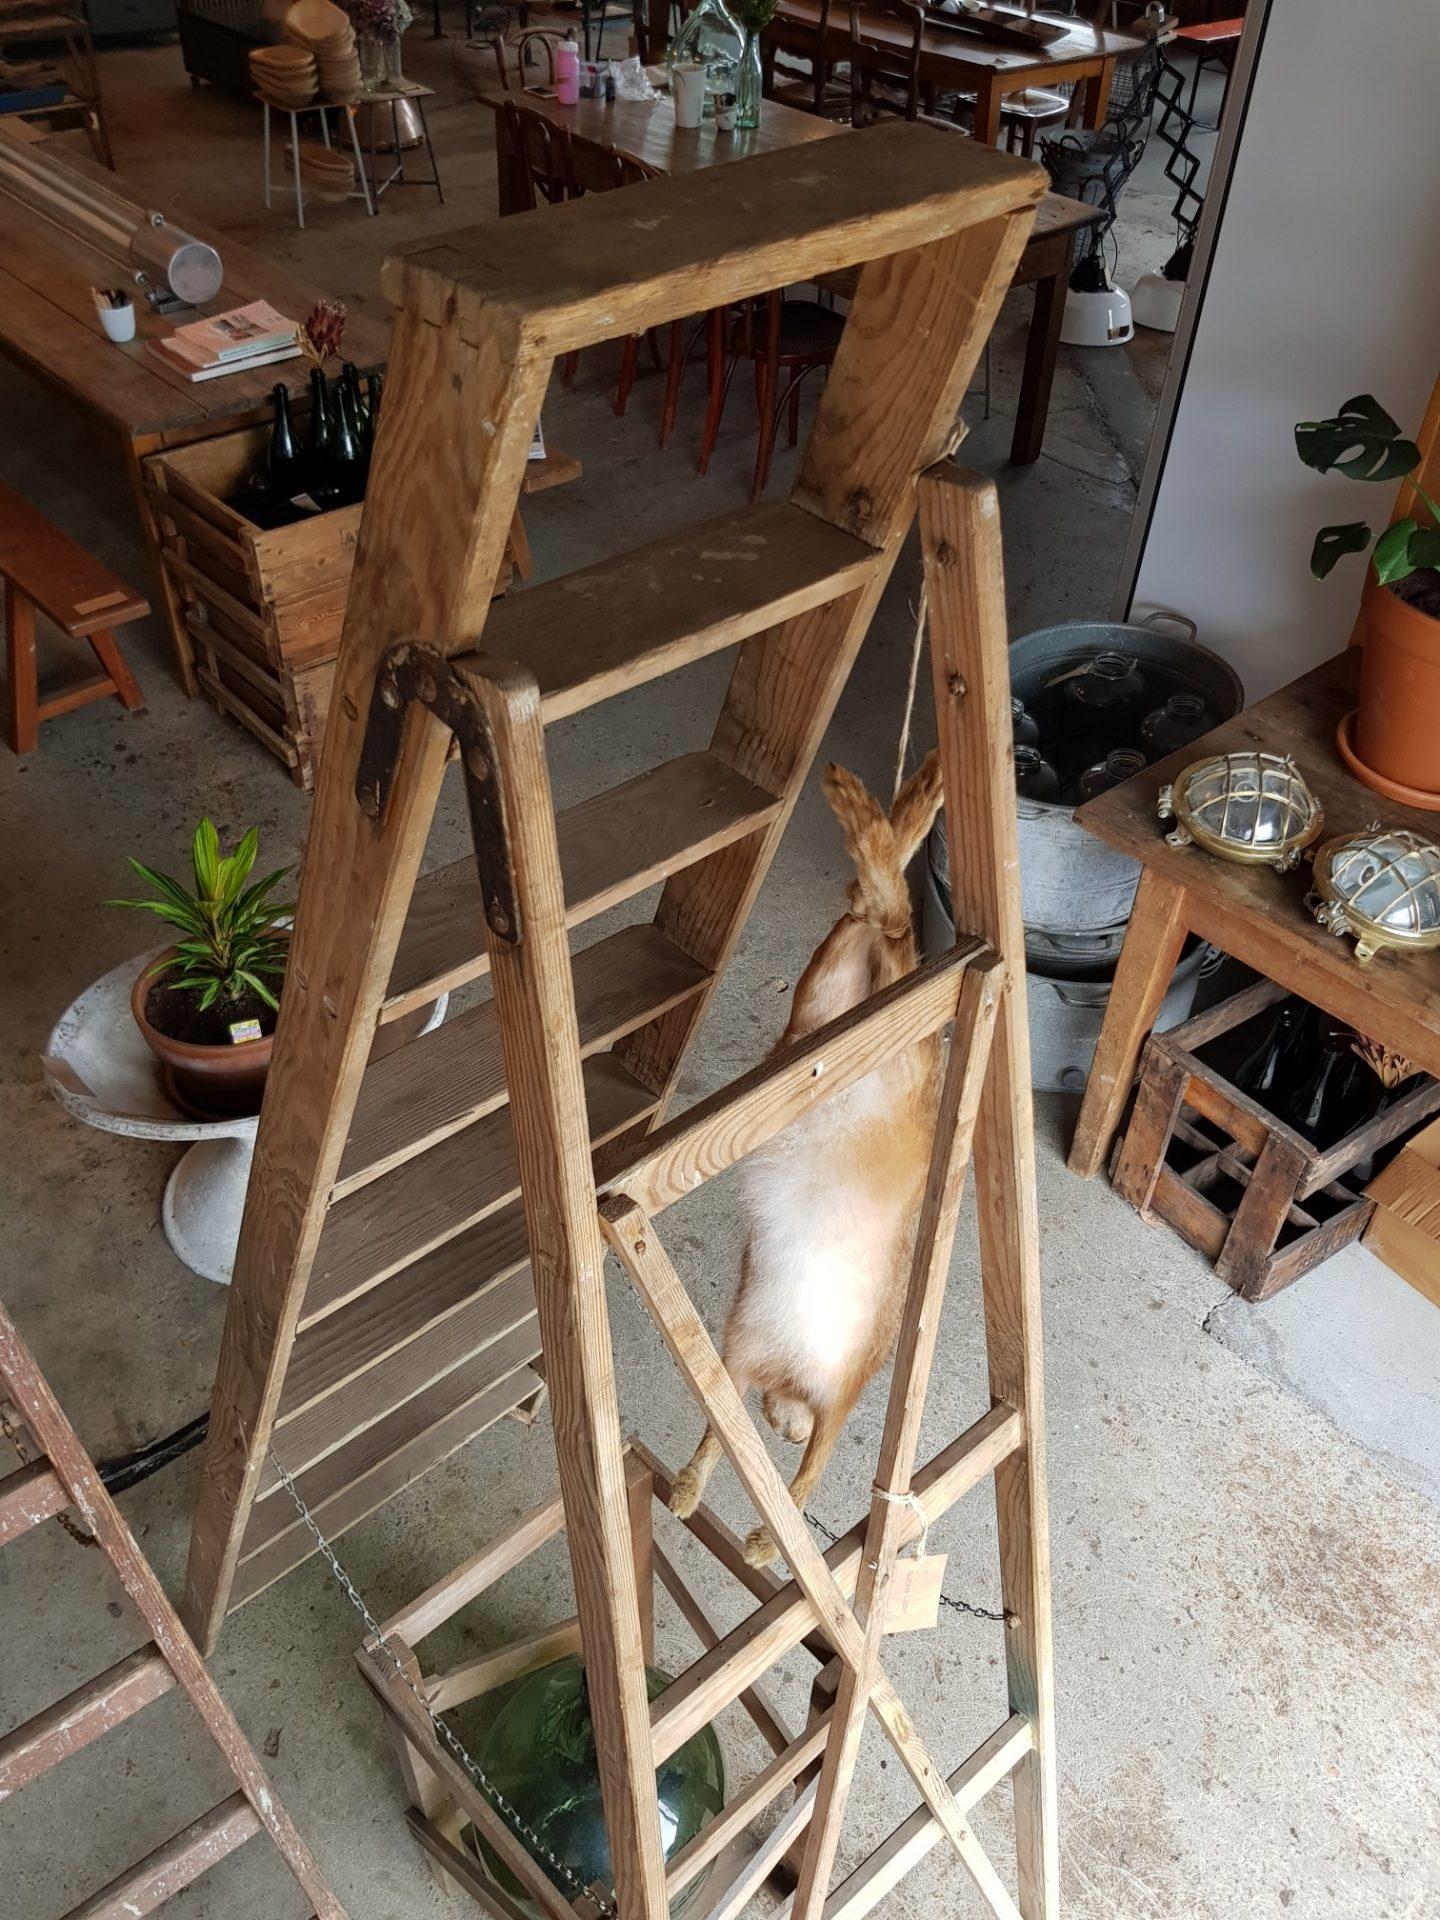 painters Ladder6